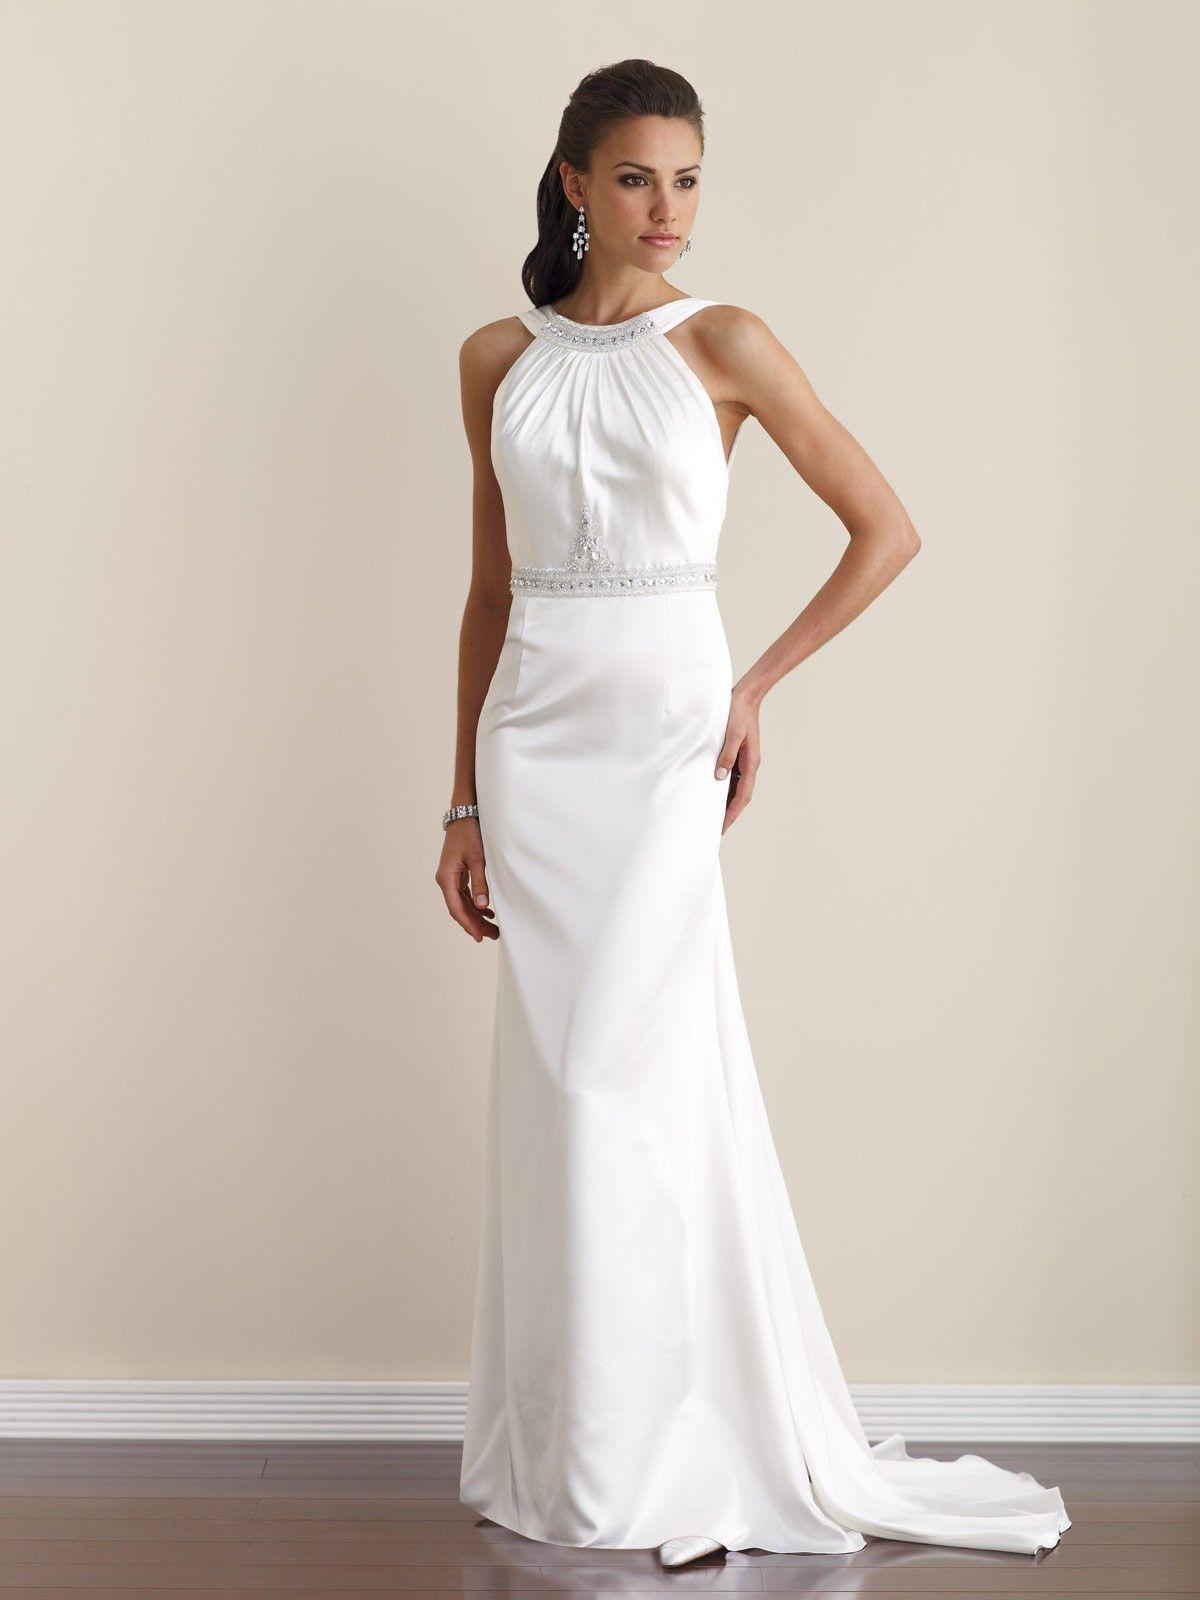 Elegant high neck beaded sheath informal simple wedding dress w